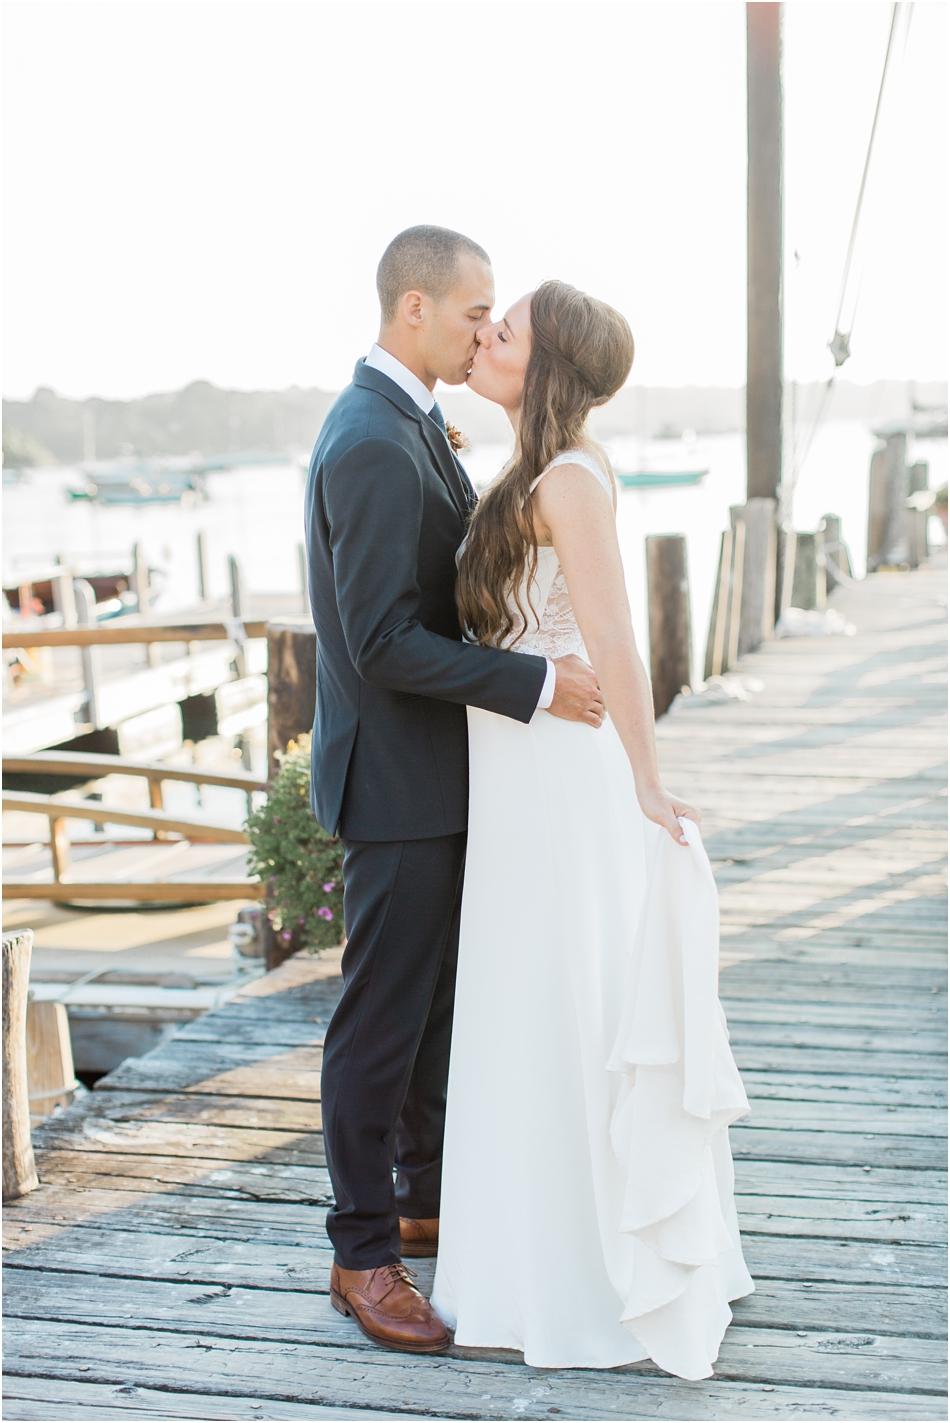 quissett_harbor_house_tented_caity_joe_cape_cod_boston_new_england_wedding_photographer_Meredith_Jane_Photography_photo_2531.jpg